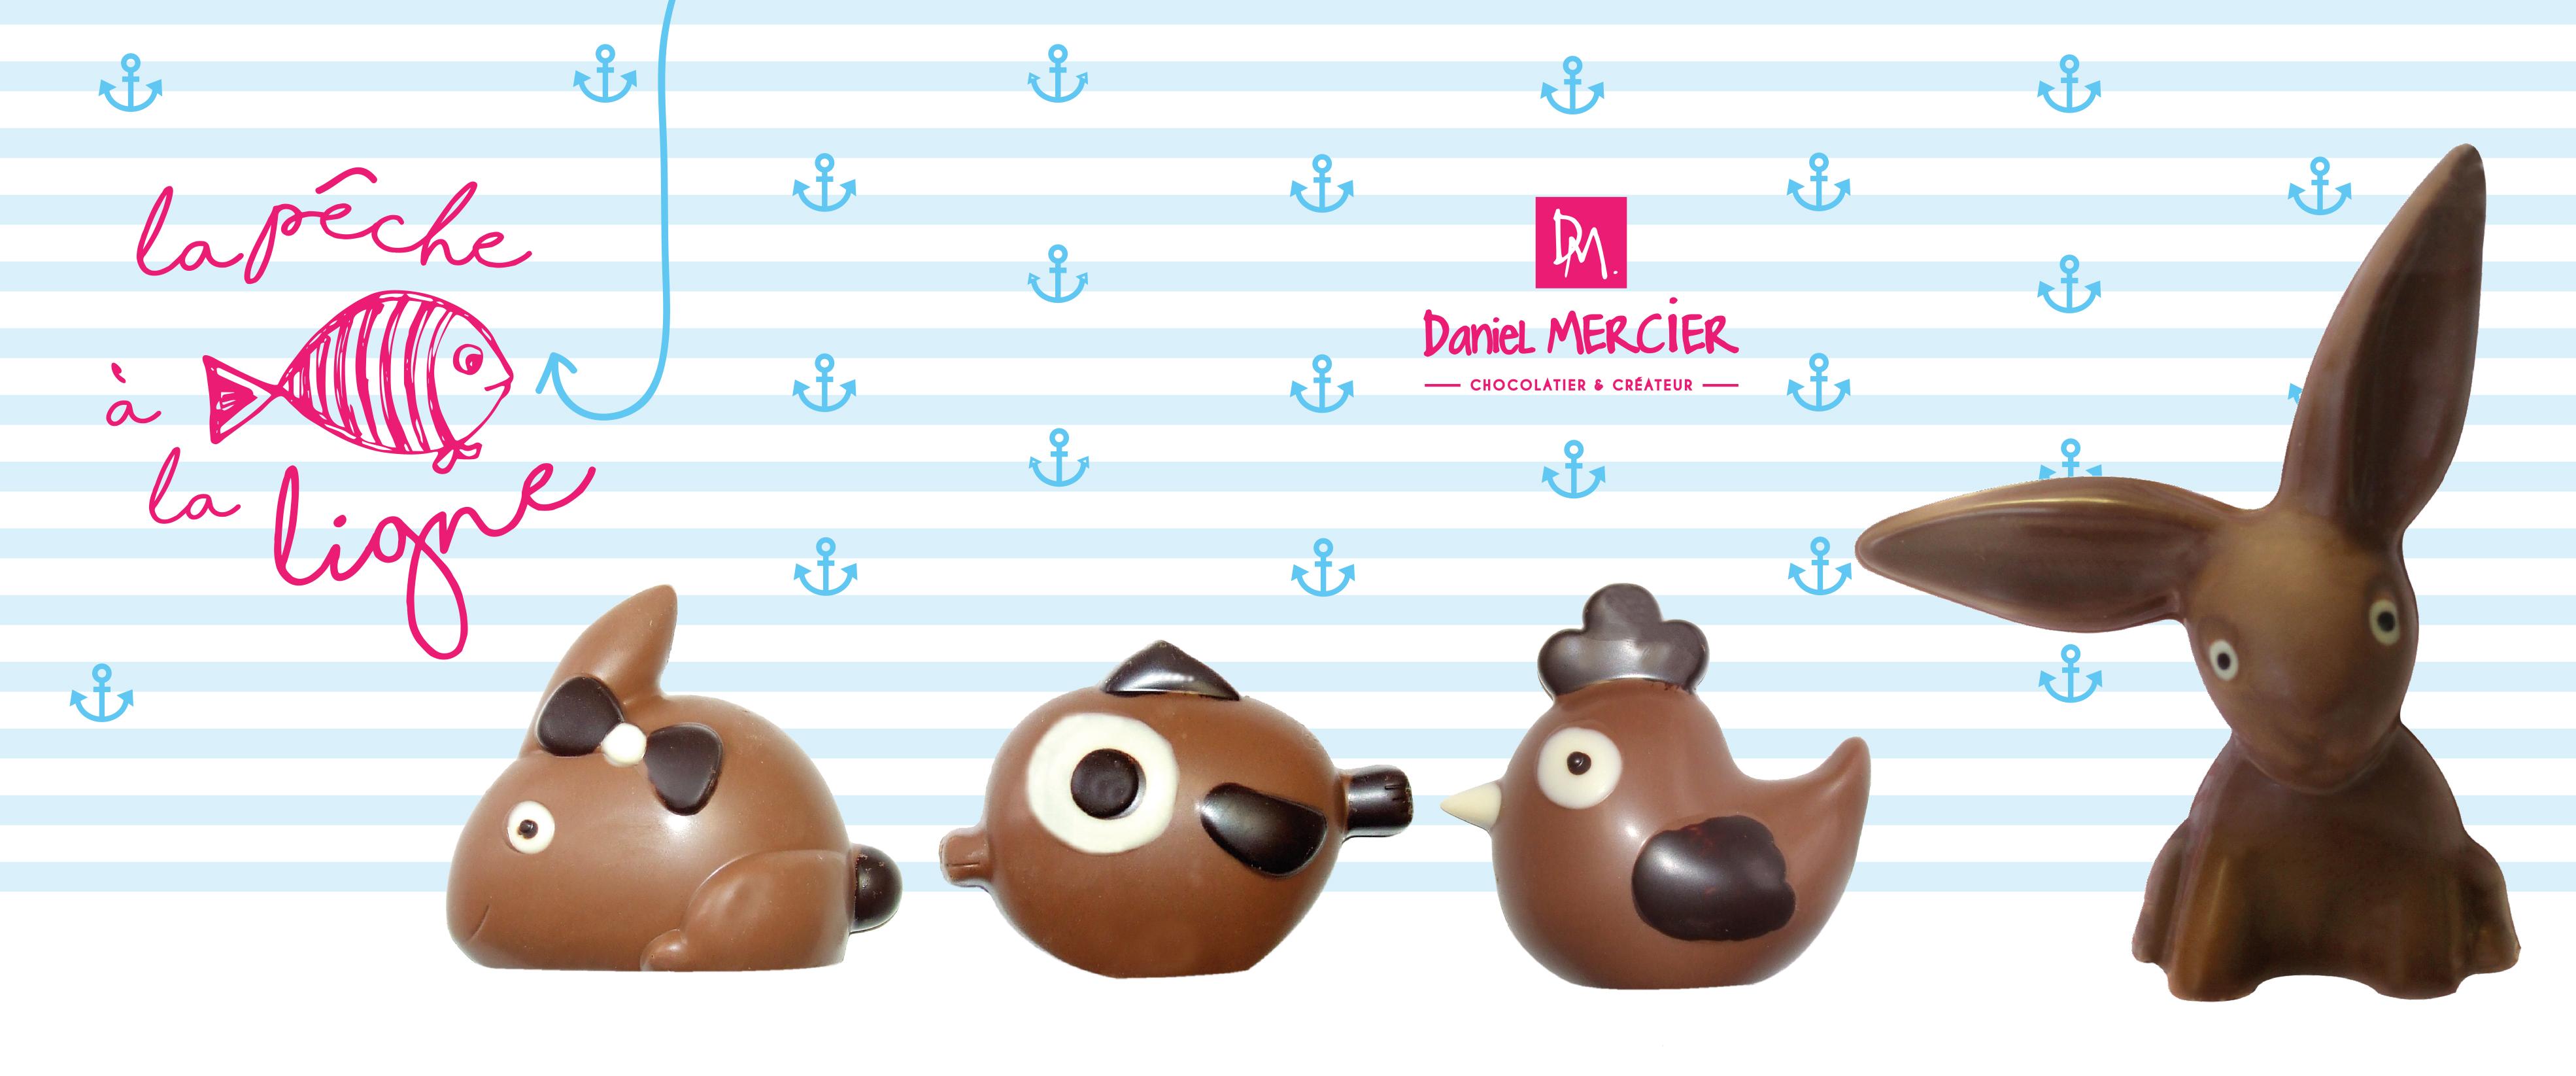 Chocolaterie Mercier Pâques